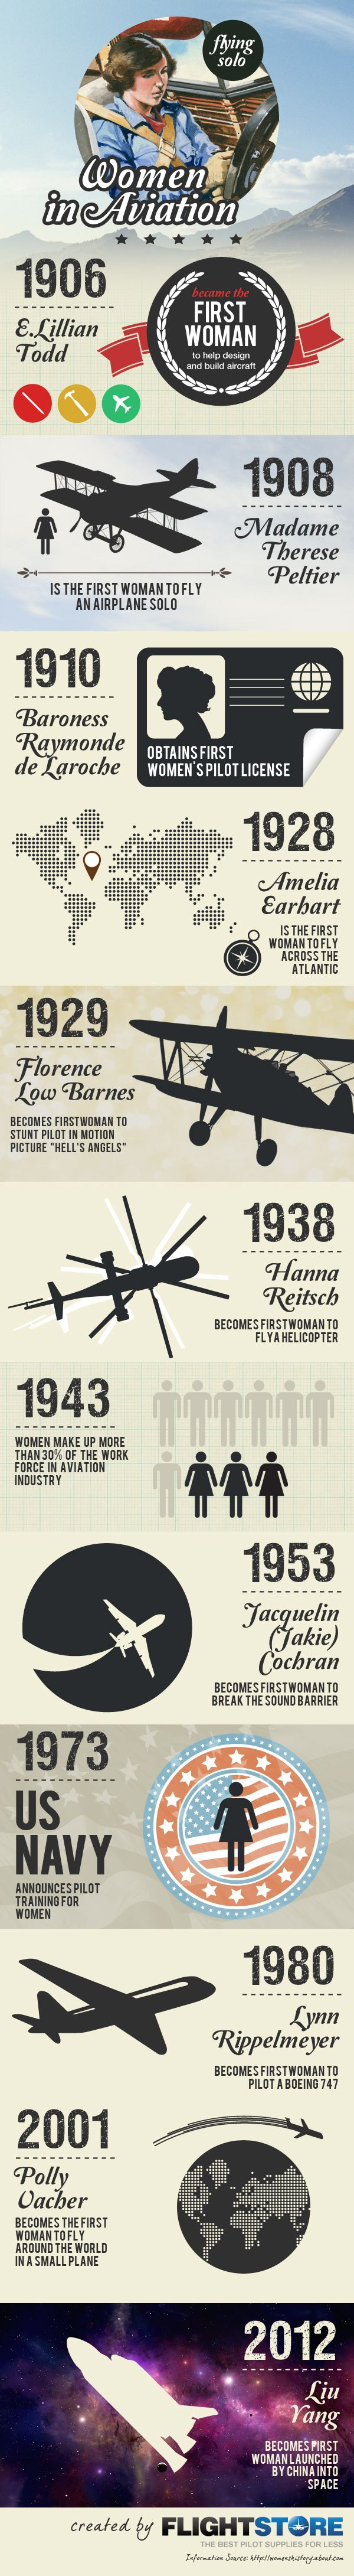 Women In Aviation [INFOGRAPHIC] #women#aviation